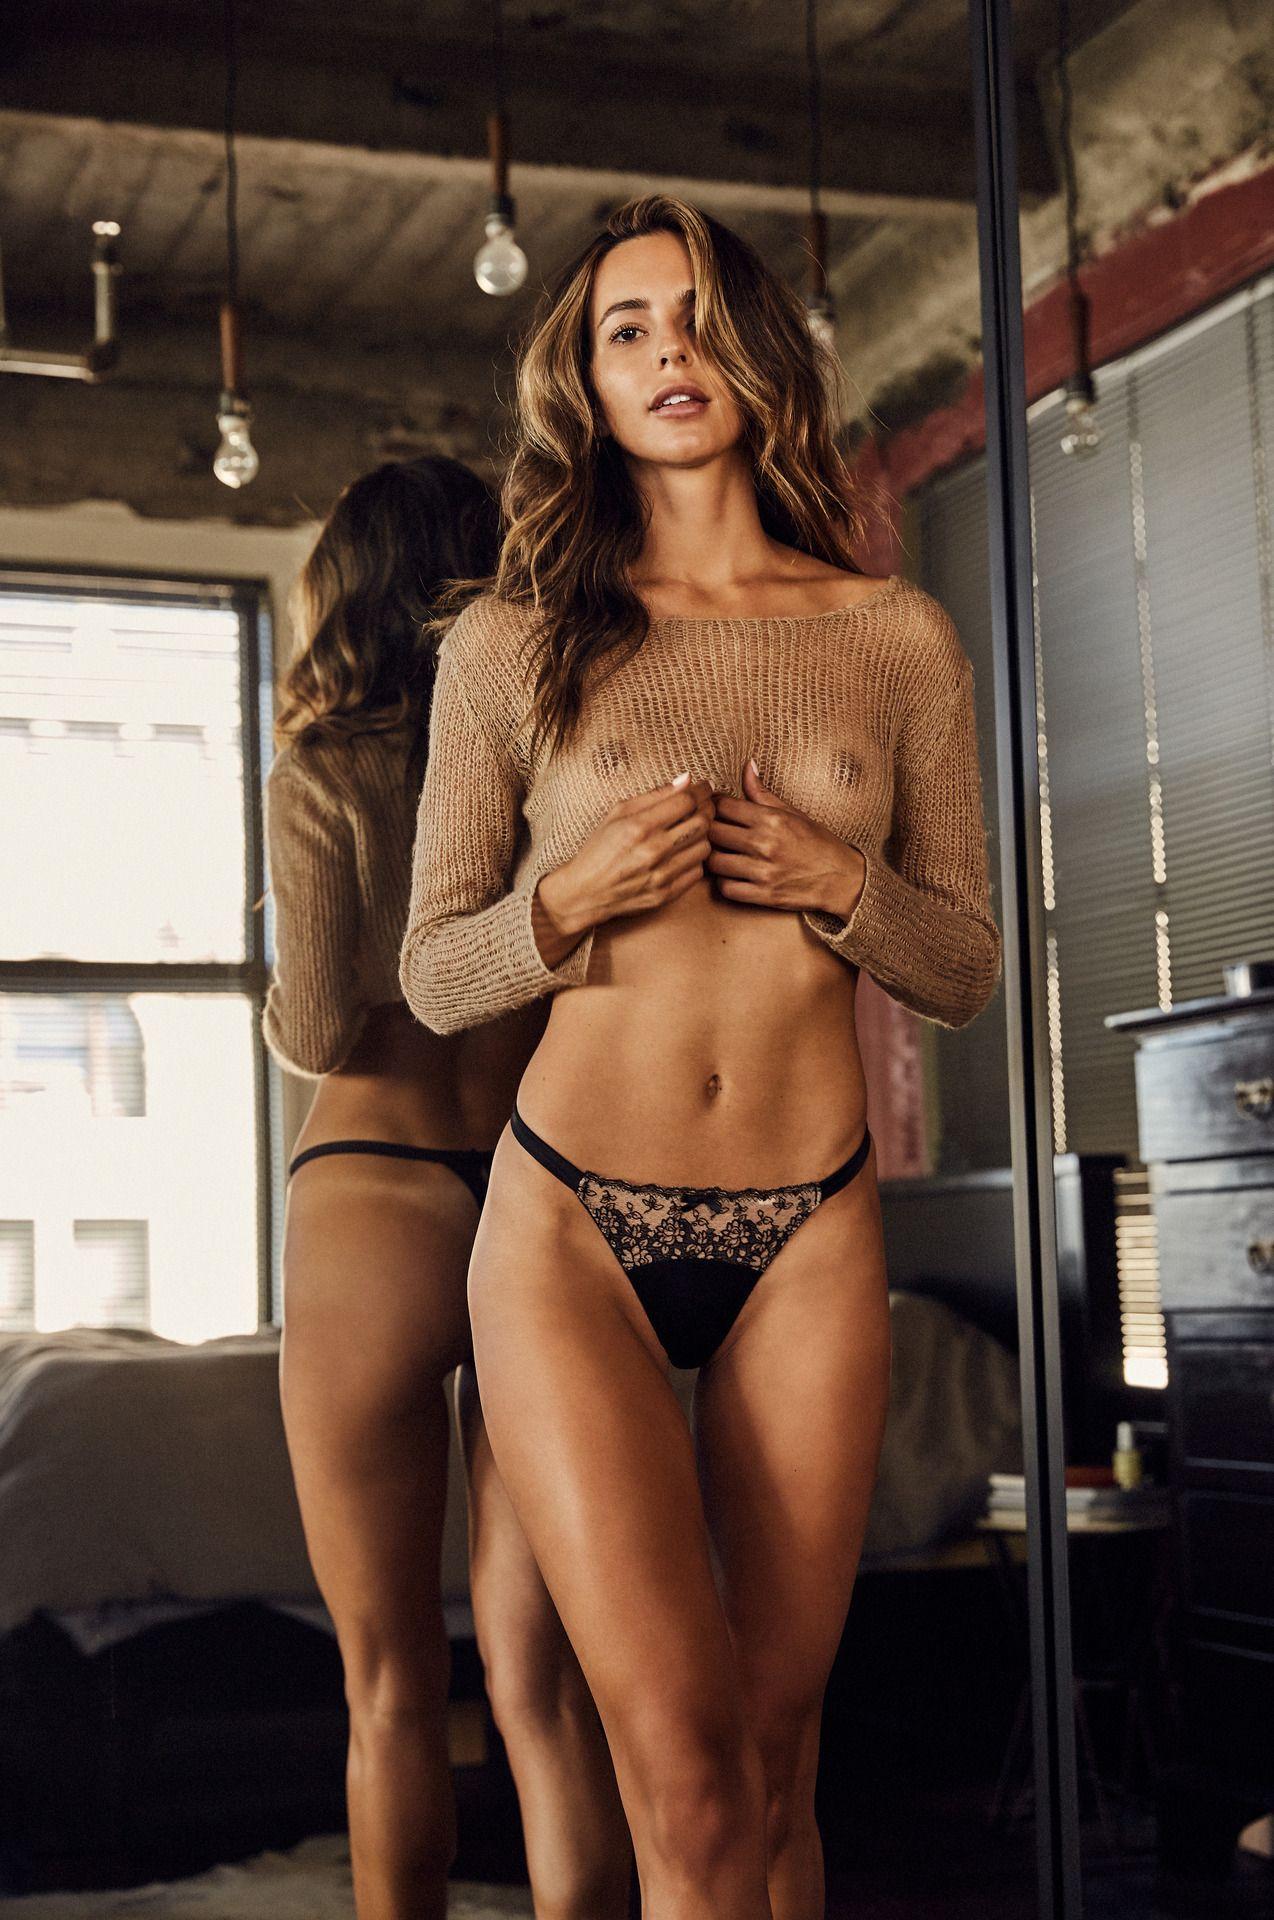 Amanda Pizziconi nudes (12 photo), pictures Bikini, Twitter, legs 2020